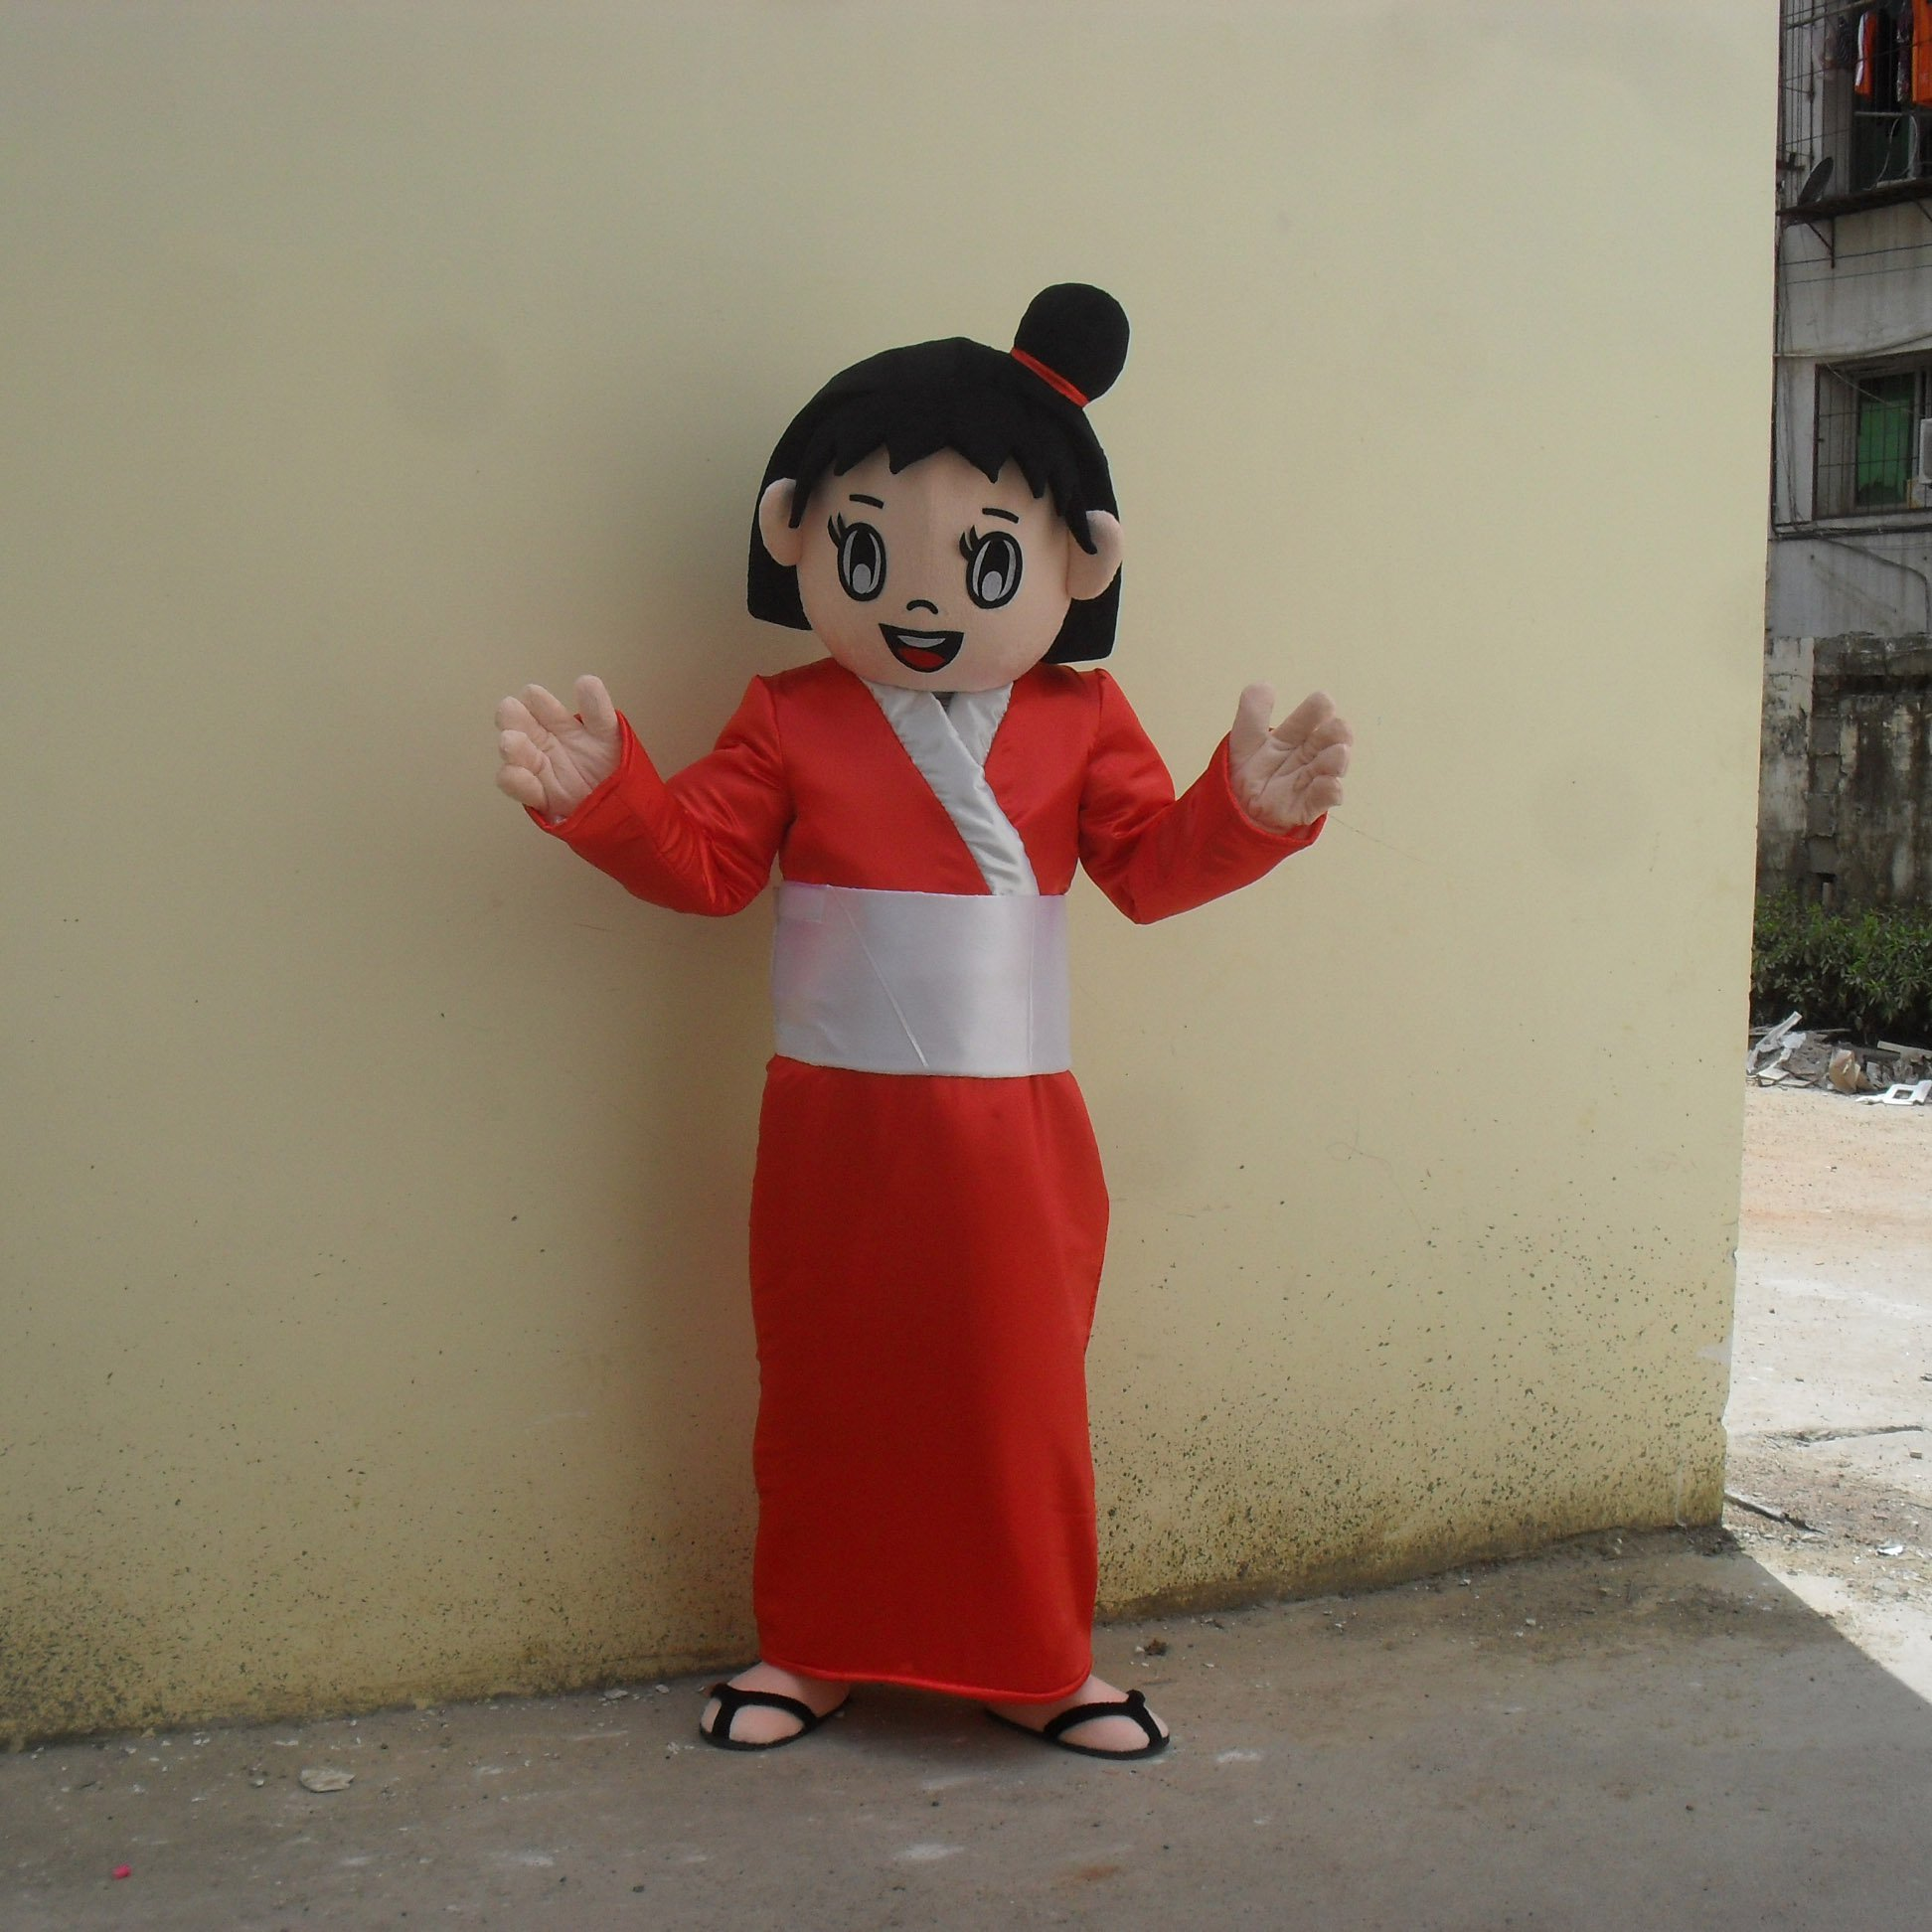 Cartoon Doll Clothing Cartoon Walking Doll Clothing Cartoon Show Clothing Japan This Girl Doll Clothes Mascot Costume